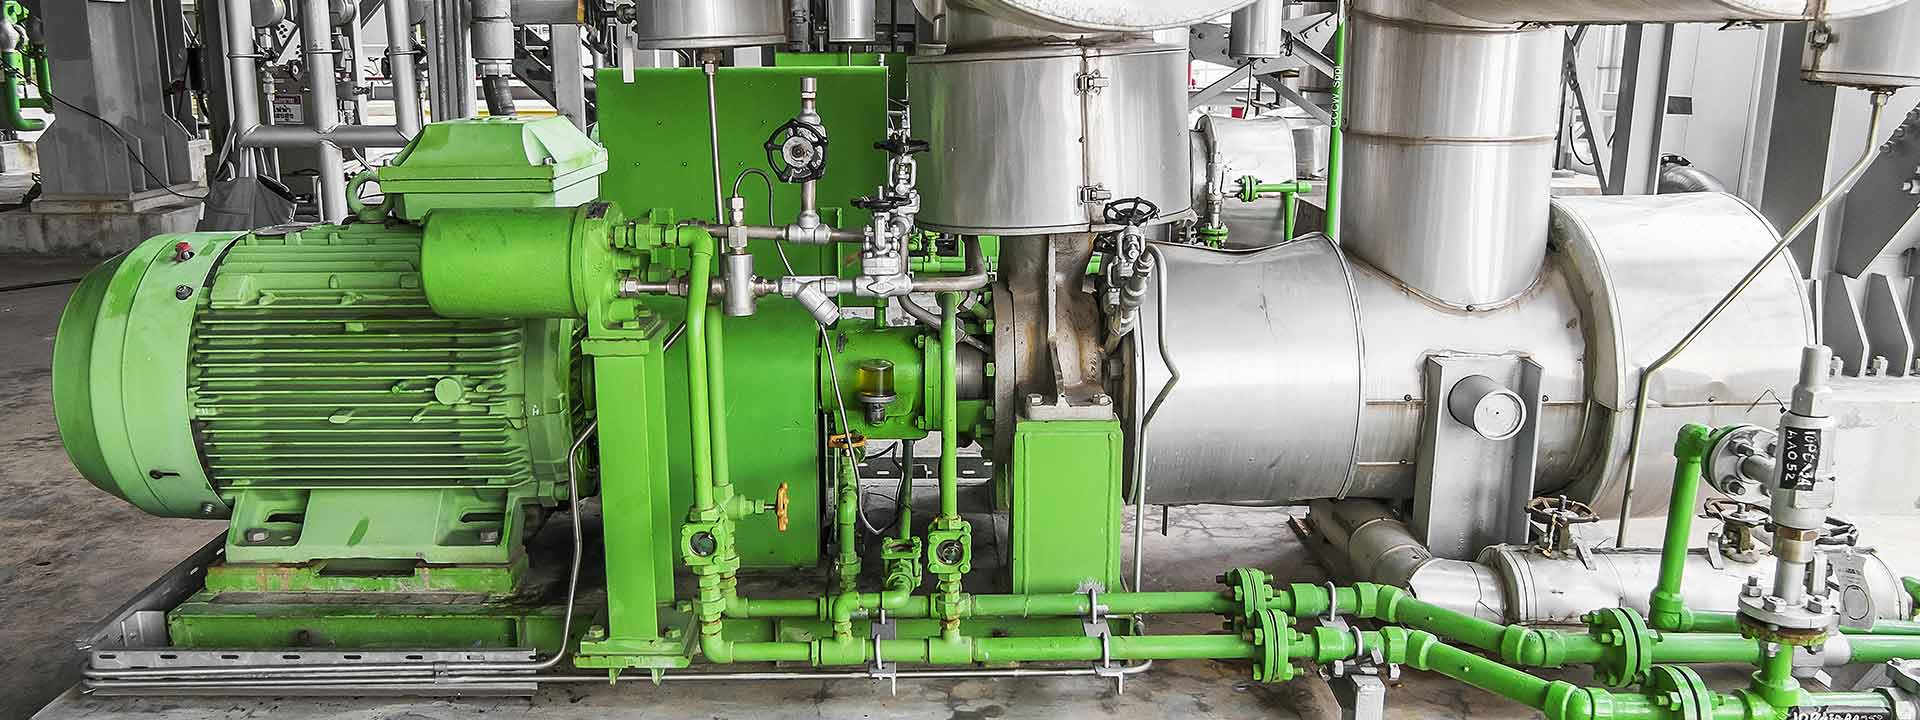 Green motor ready for testing